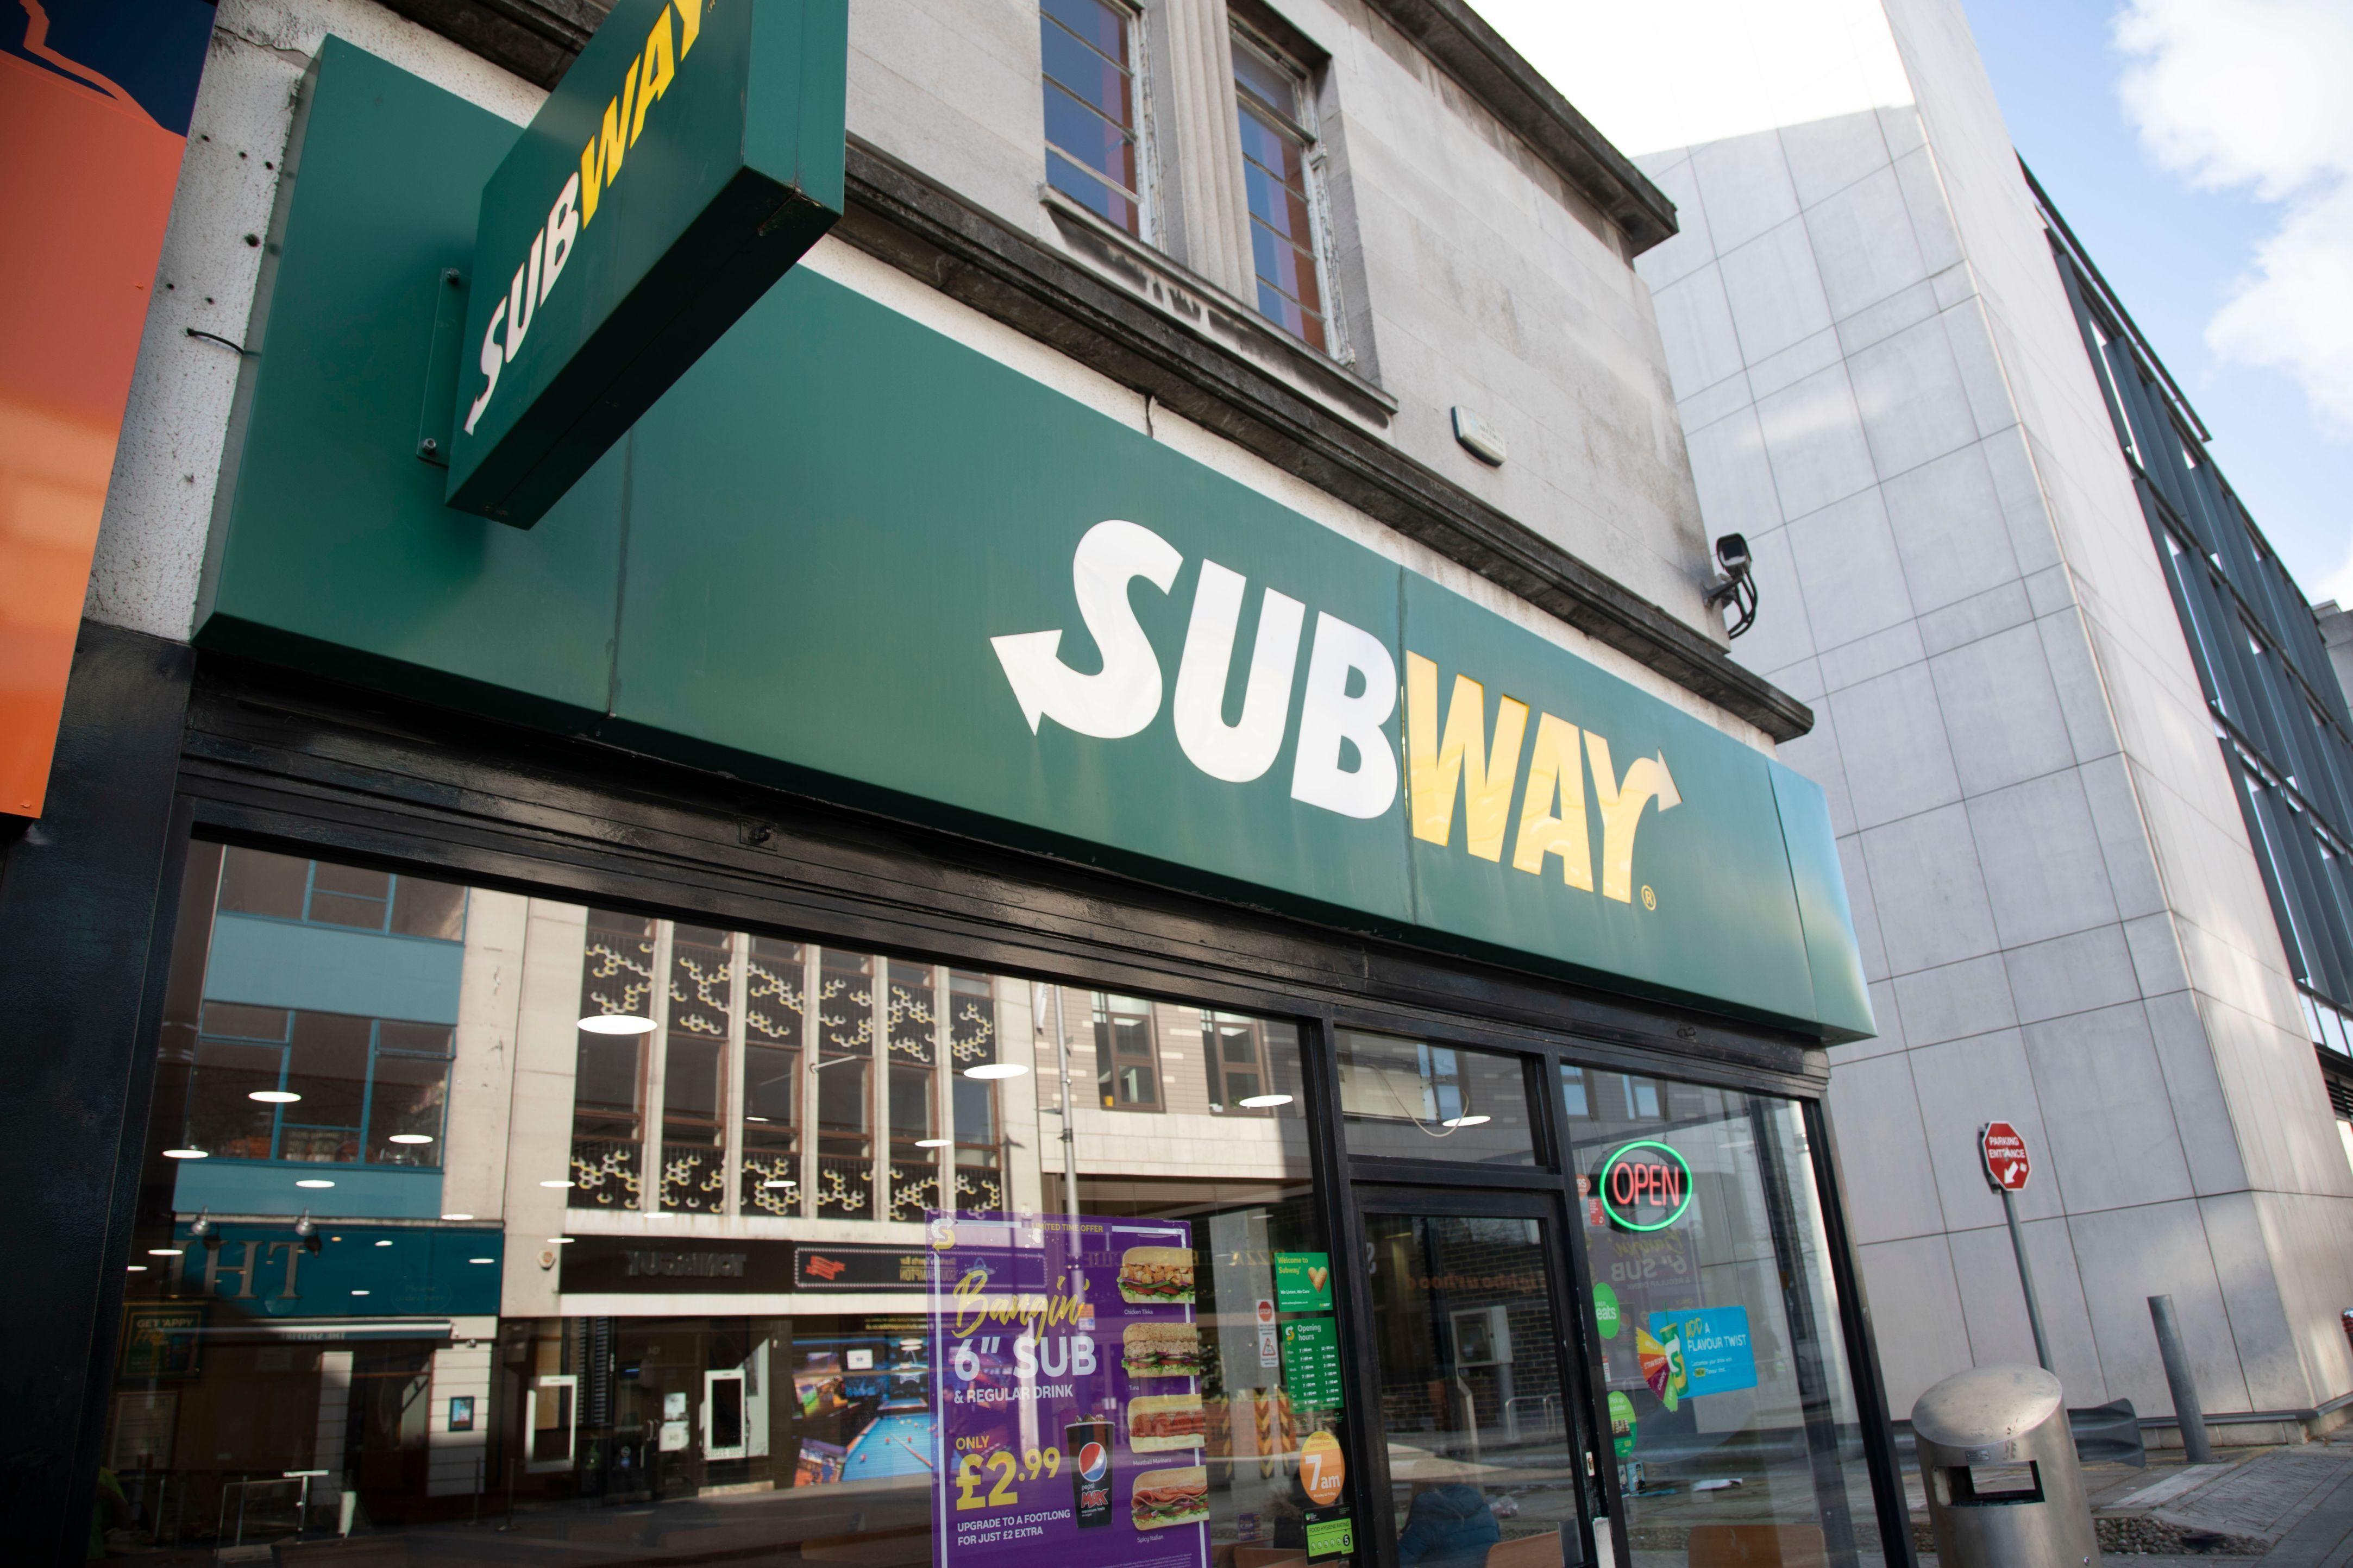 Subway (East St)